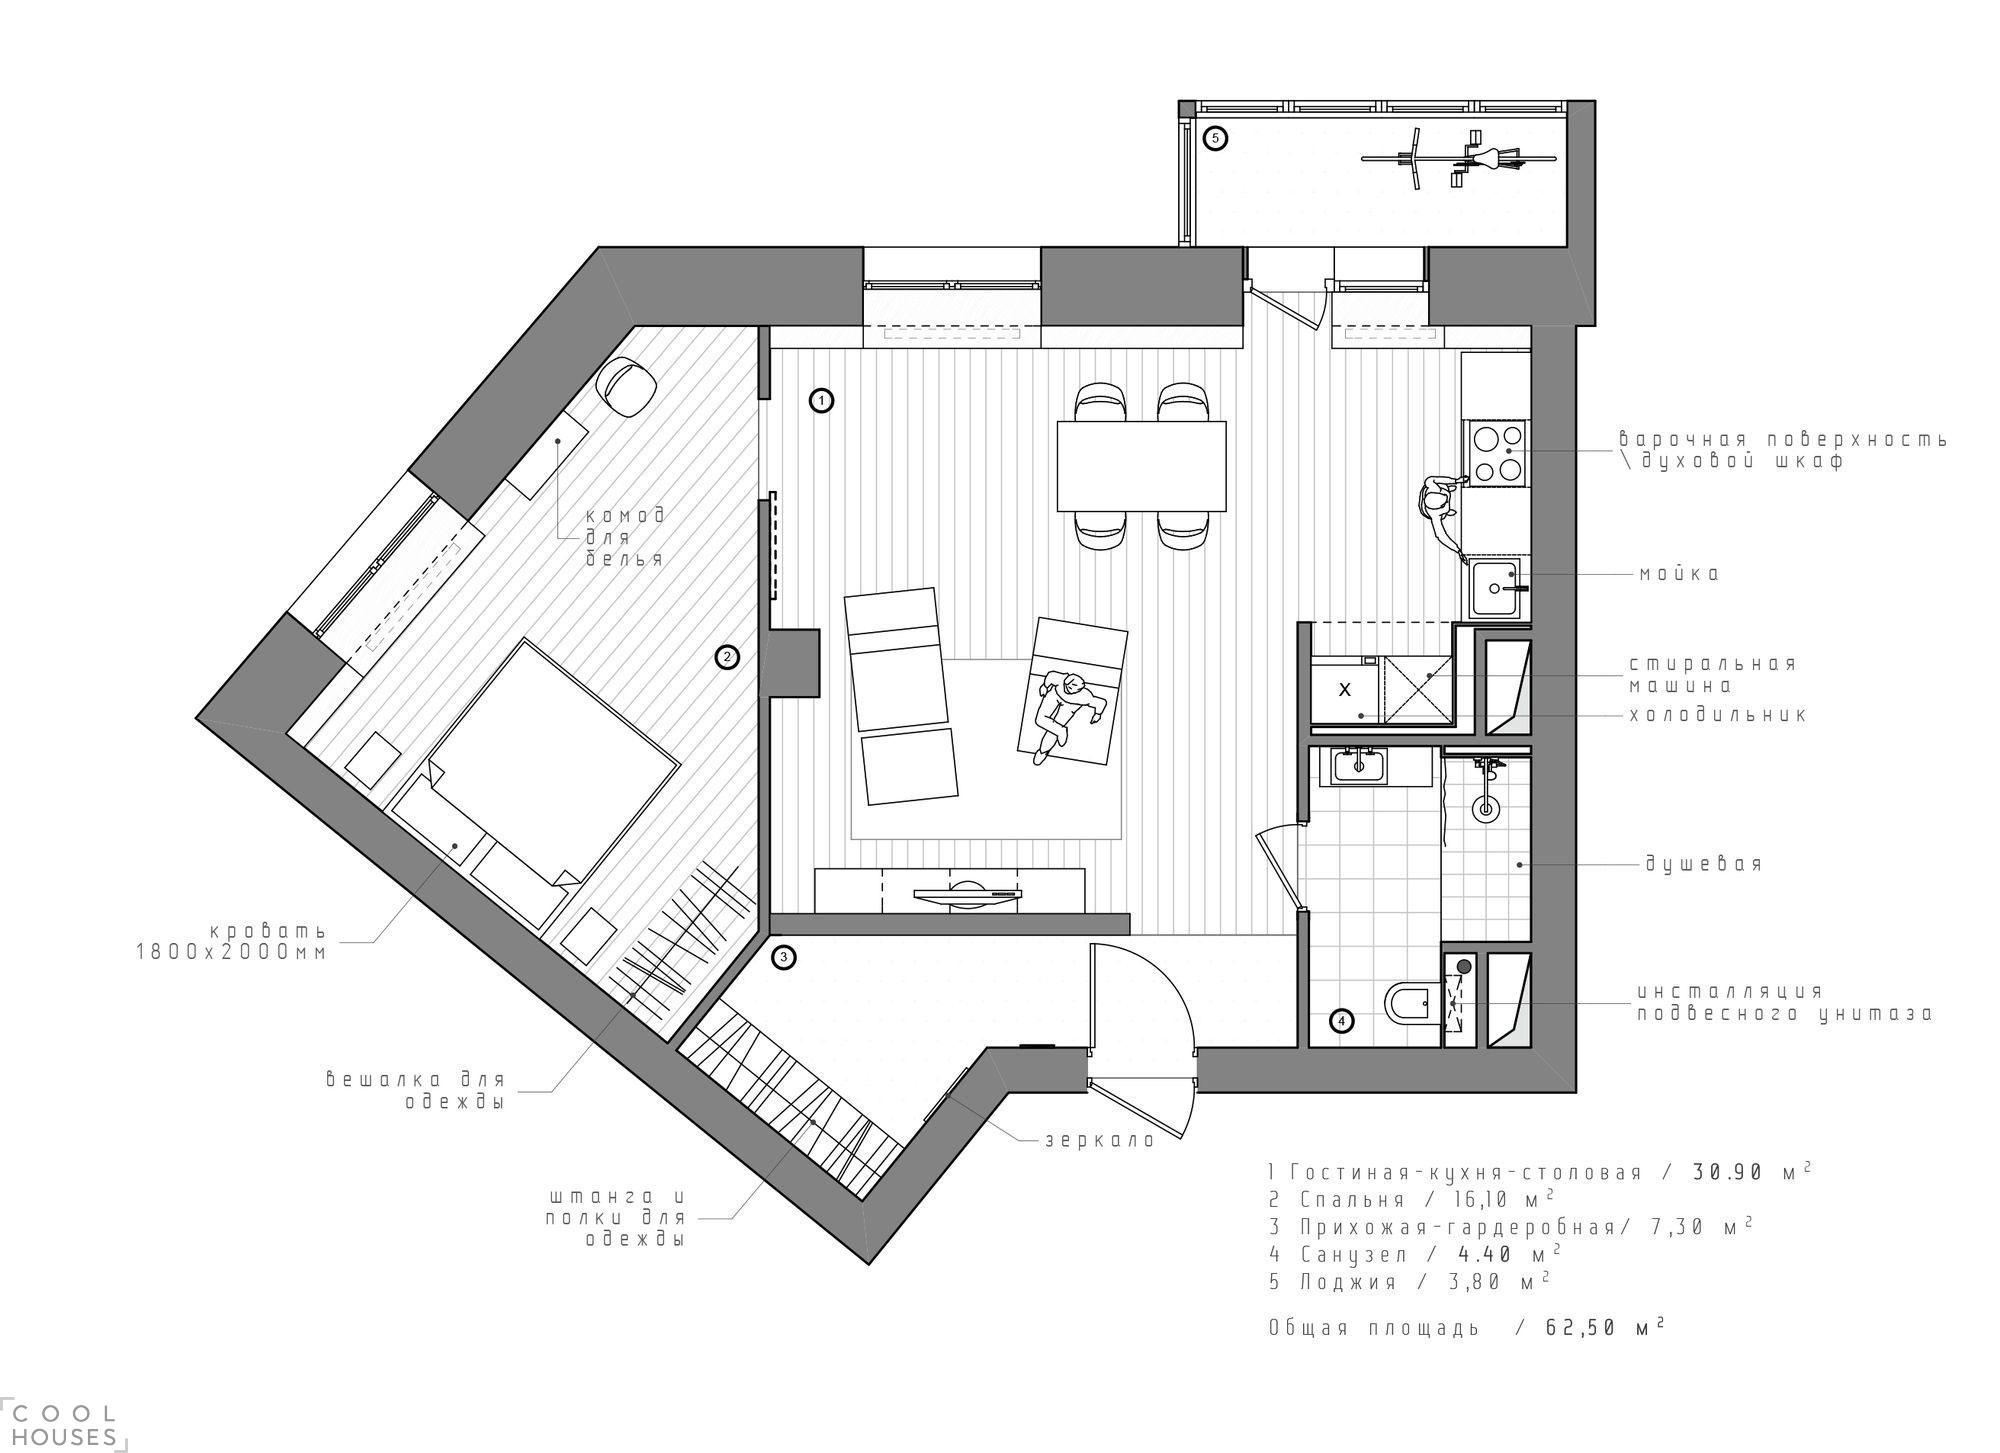 Интерьер квартиры в стиле минимализма в Санкт-Петербурге